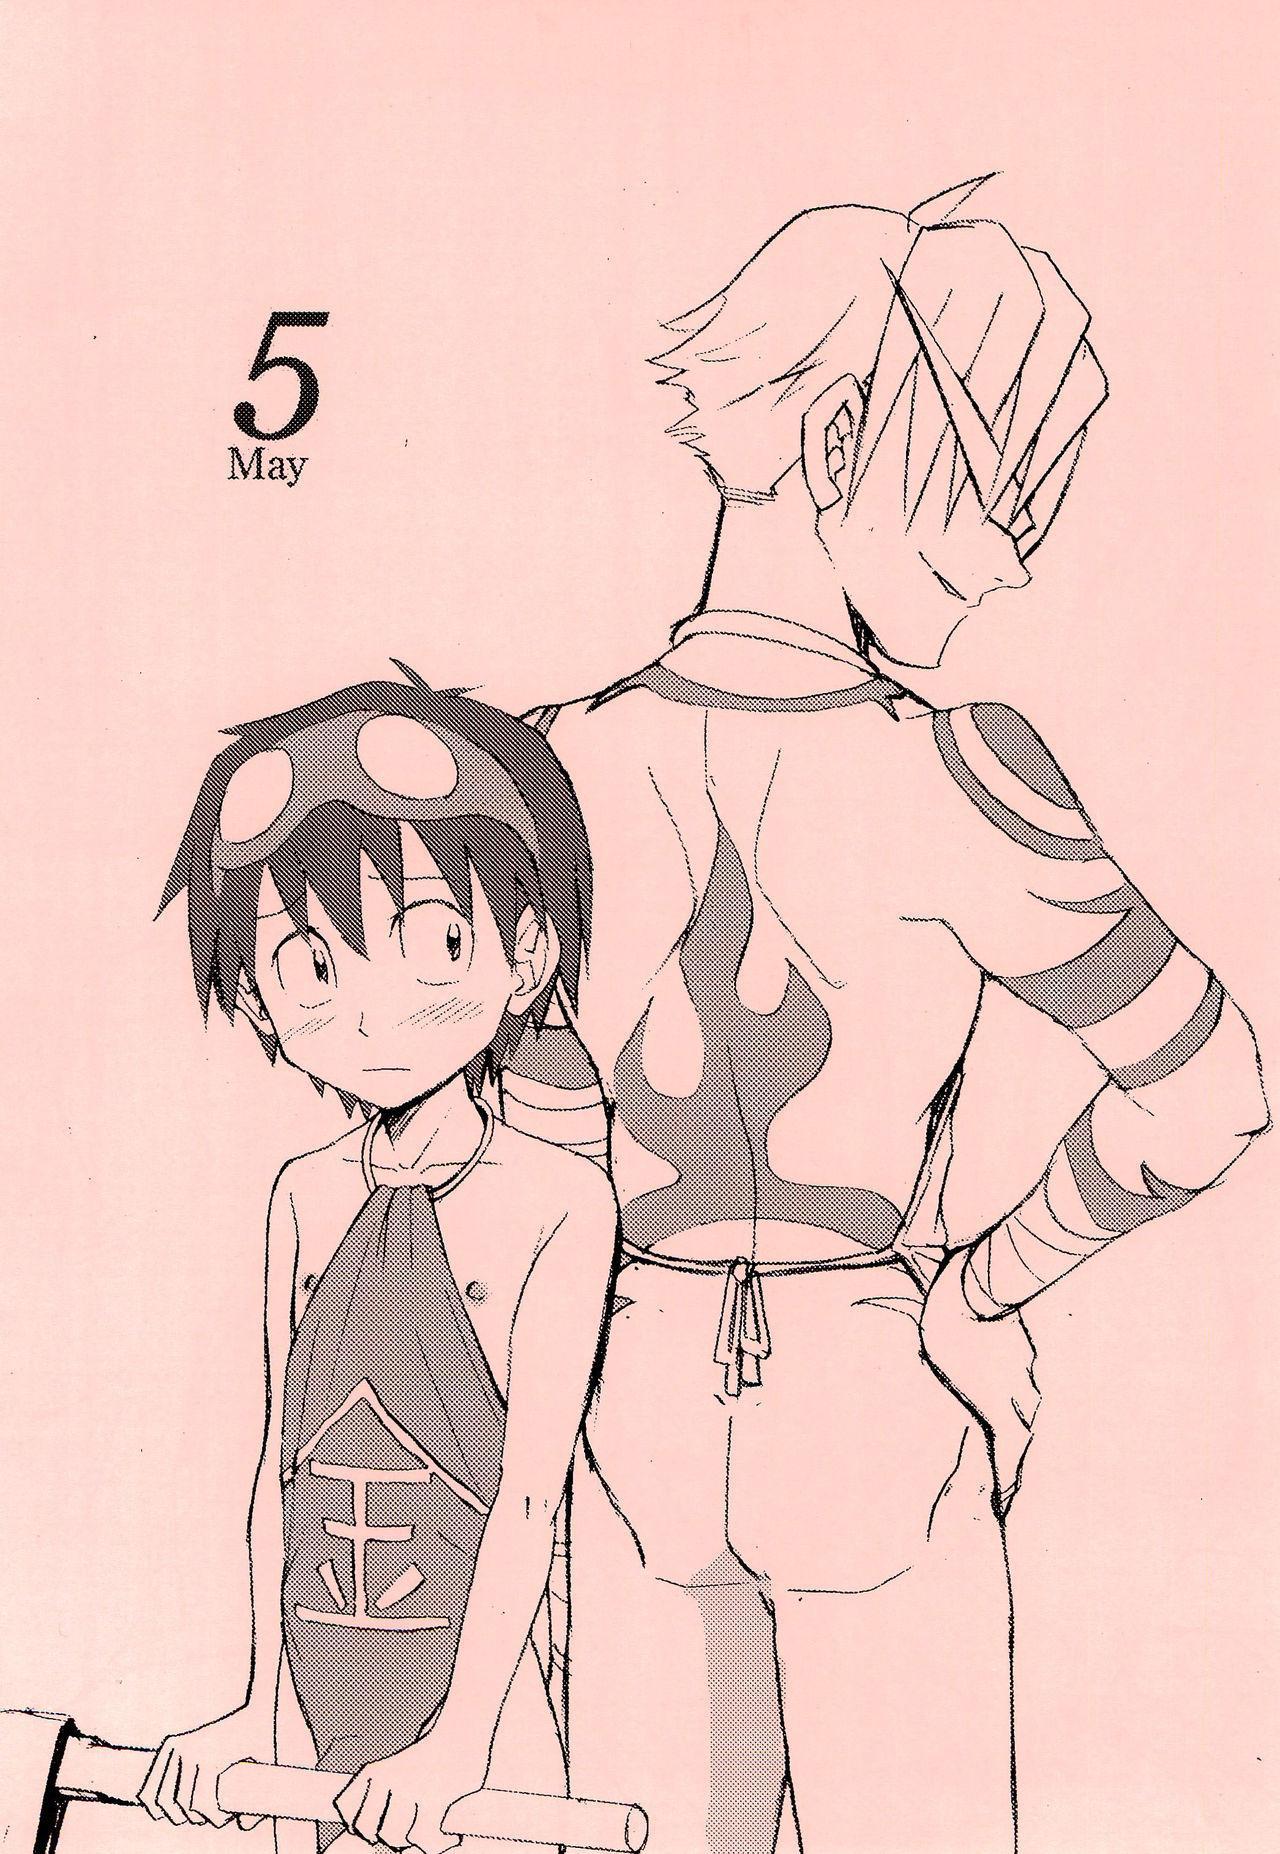 (C72) [Shamon Tei (Shamon)] KamiShimo to Ichinenjuu 2007-nen 9-gatsu - 2008-nen 8-gatsu Calendar (Gurren Lagann) 9